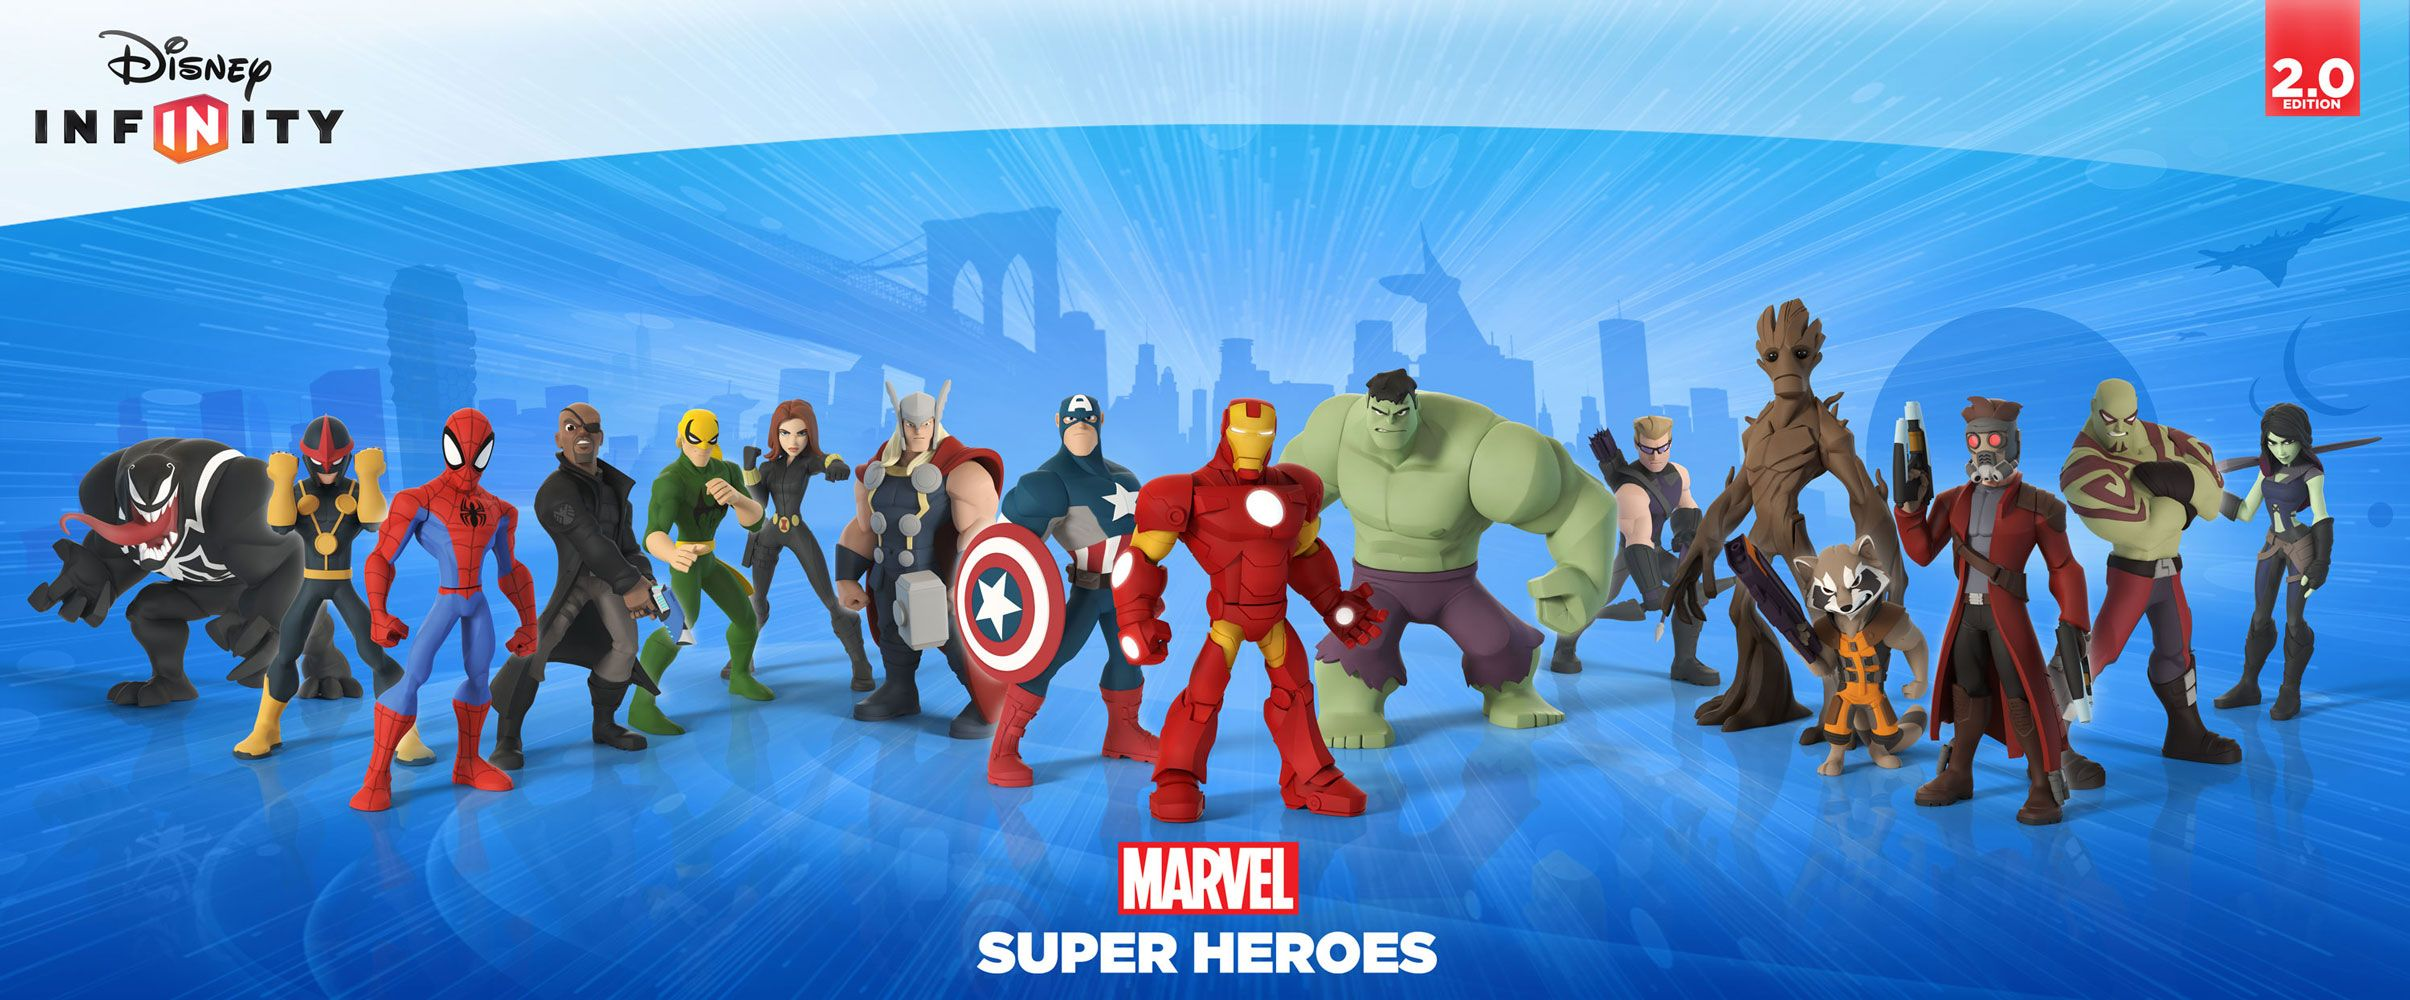 Disney Infinity 2 0 Marvel Superheroes Disney Infinita Disney Marvel Marvel Super Heróis